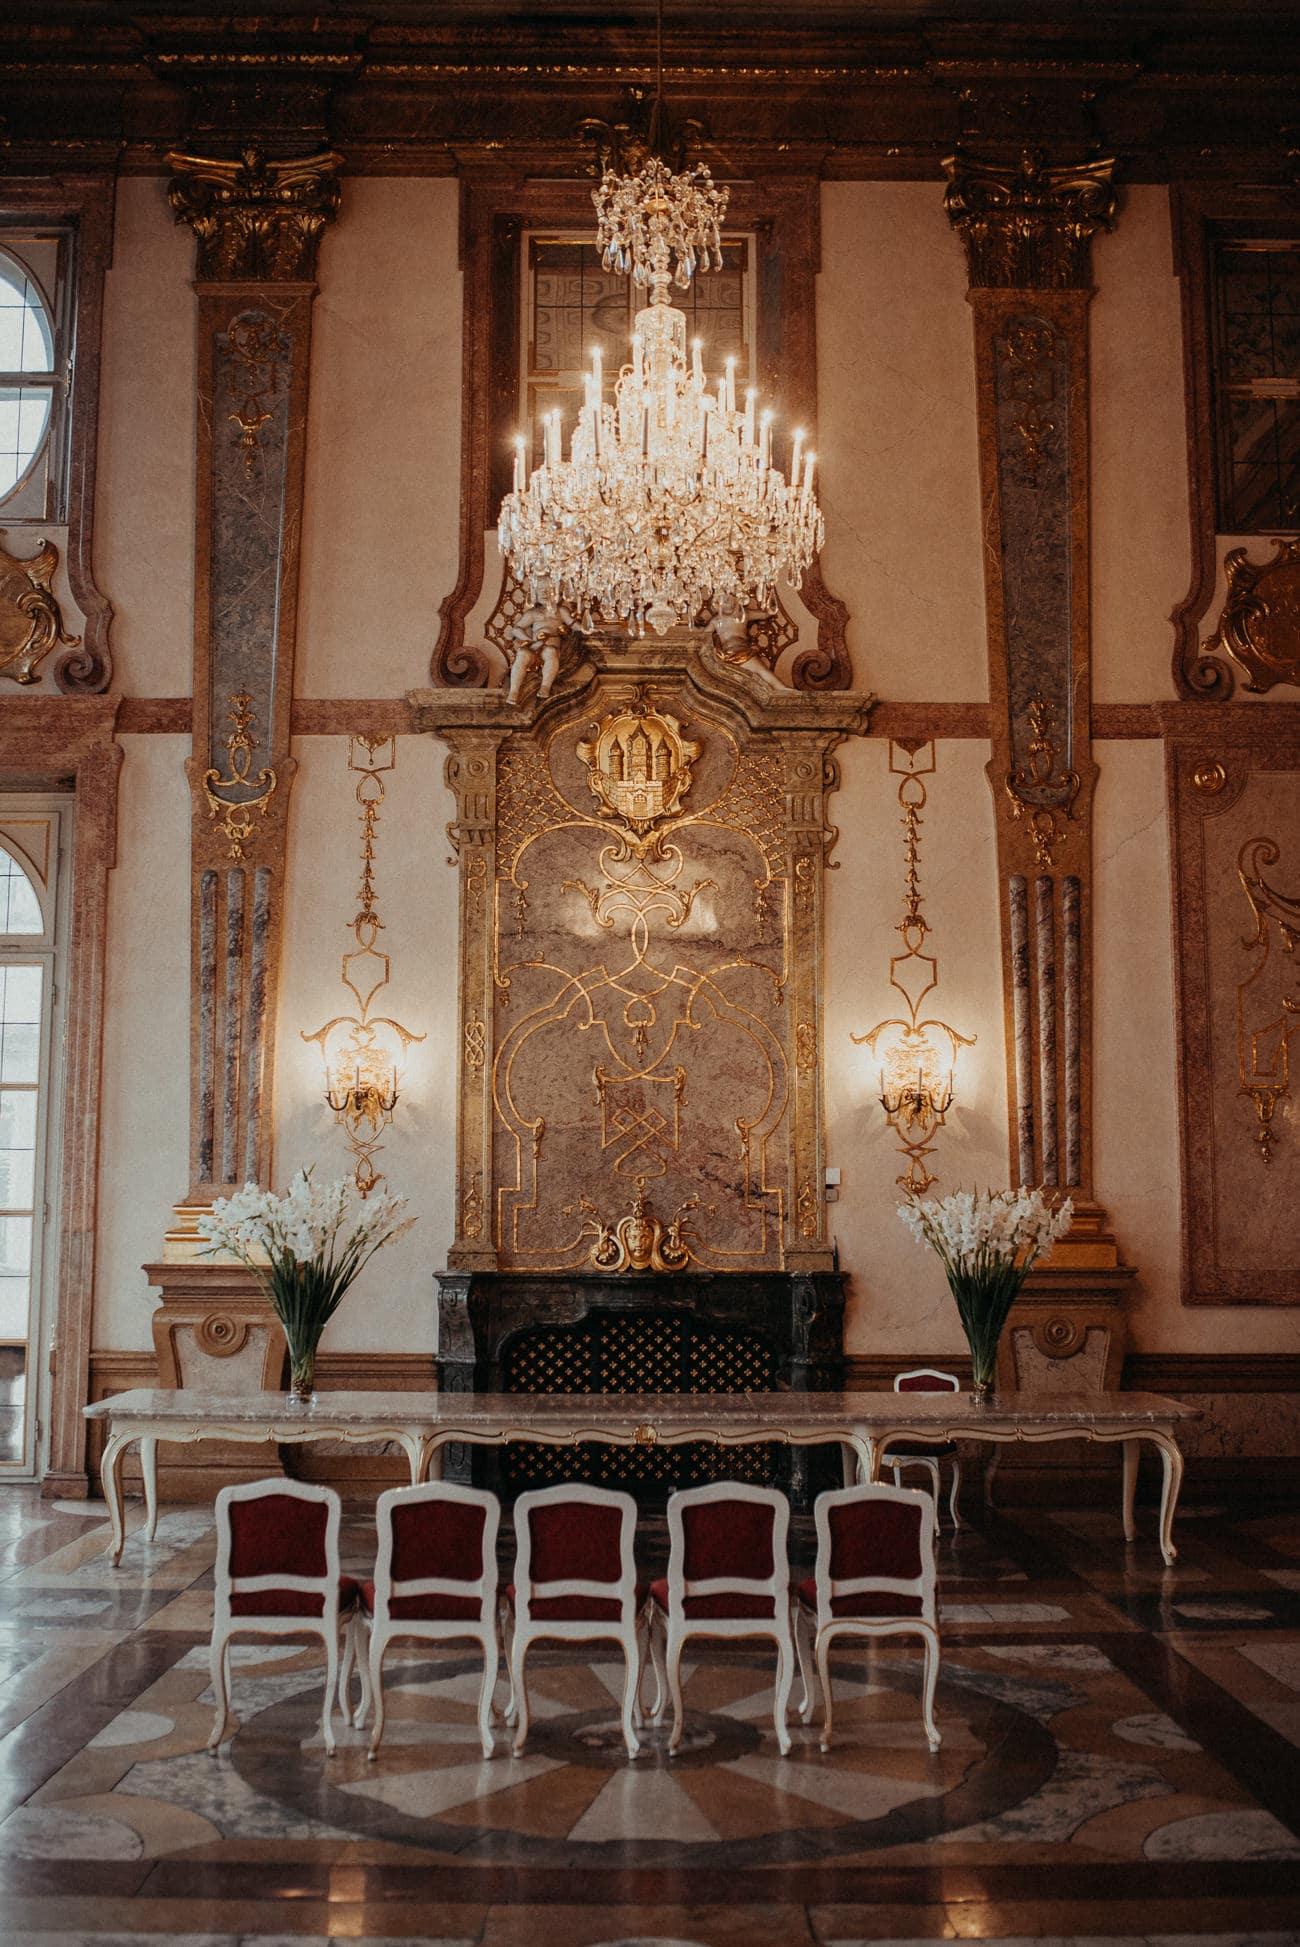 marmorsaal salzburg mirabell palace austria